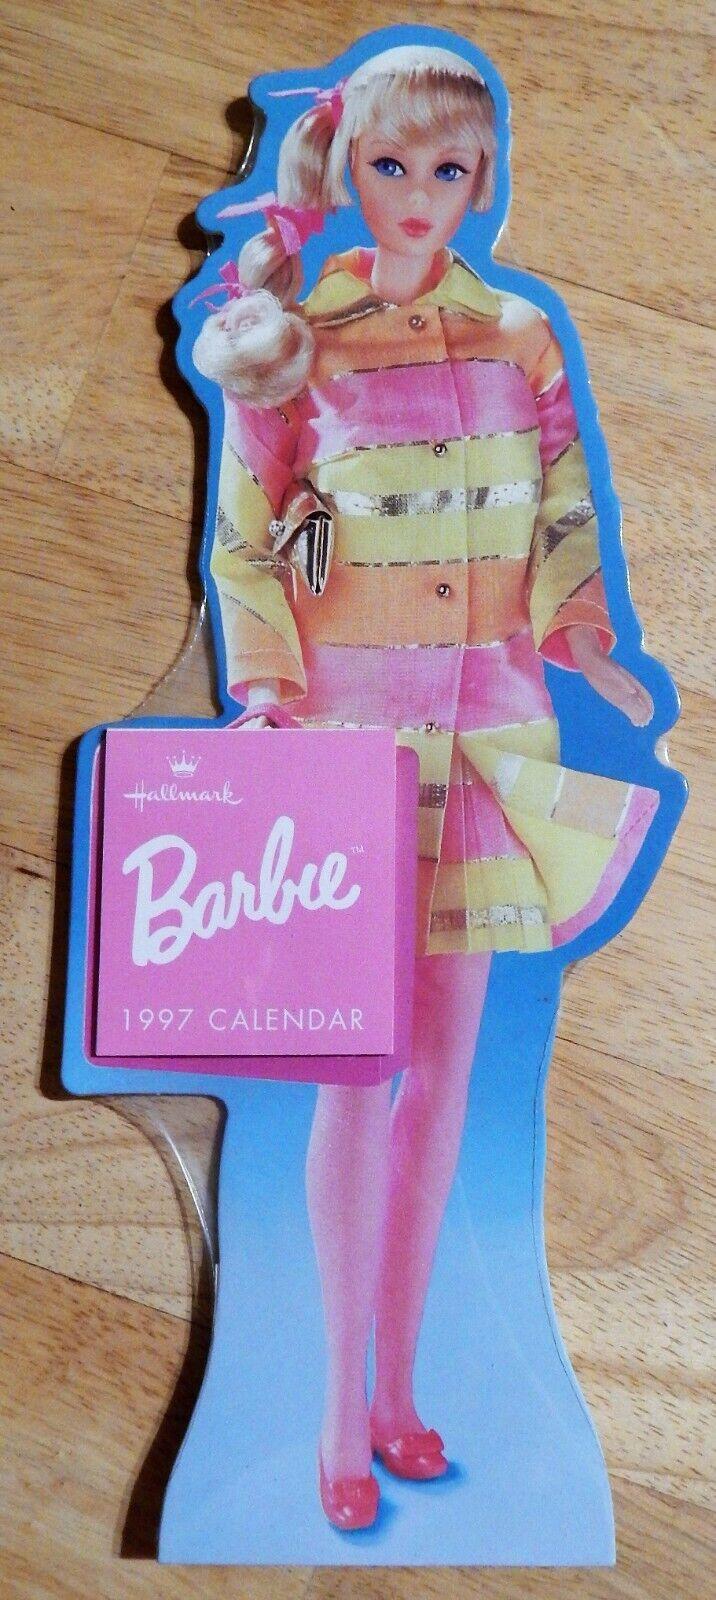 NEW Barbie Doll Hallmark Calendars 1996 /& 1997 Factory Sealed